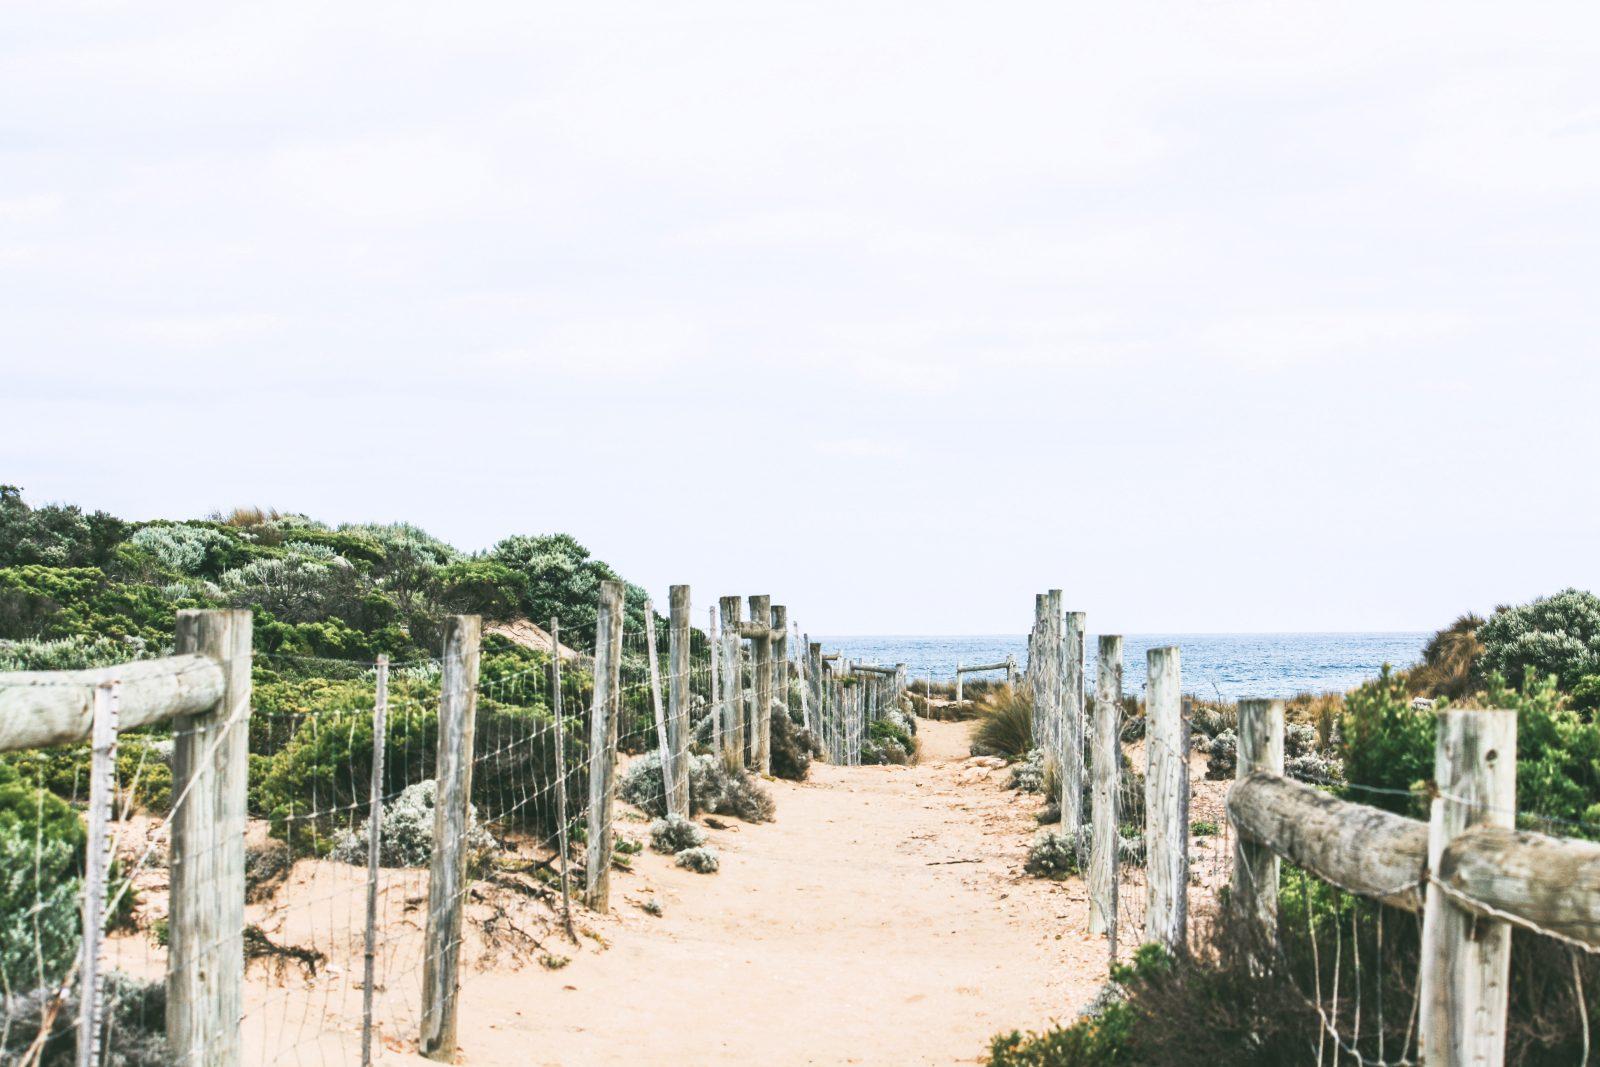 East Coast of Australia beach